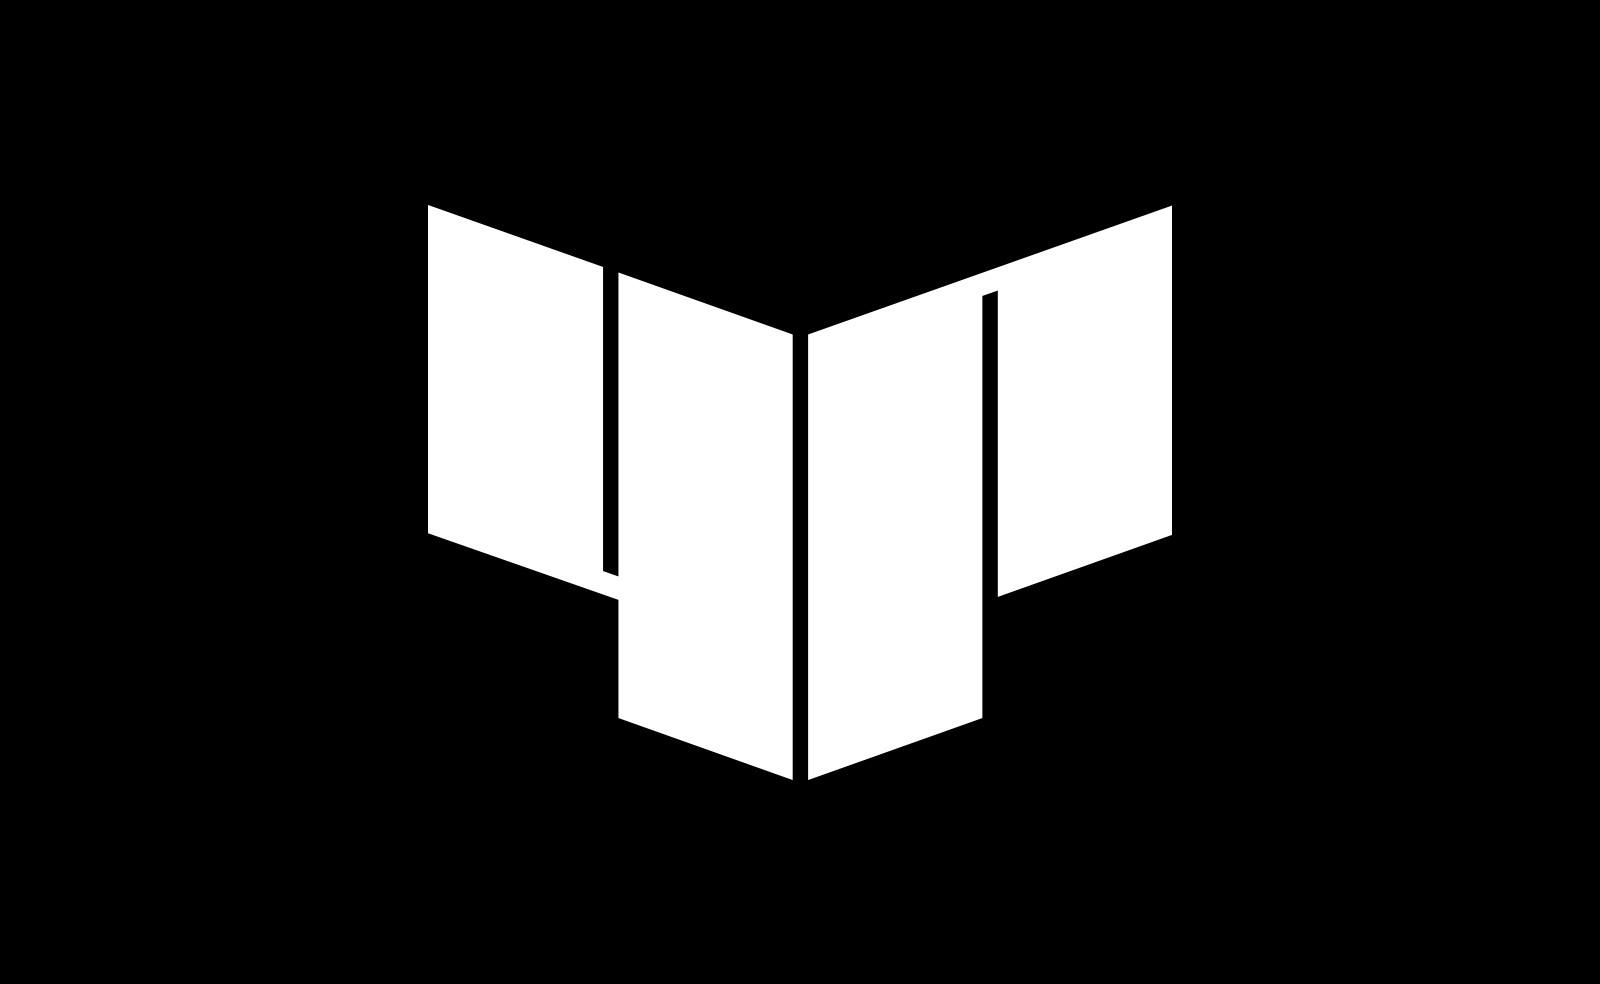 4P logotyp - vit logga mot svart bakgrund